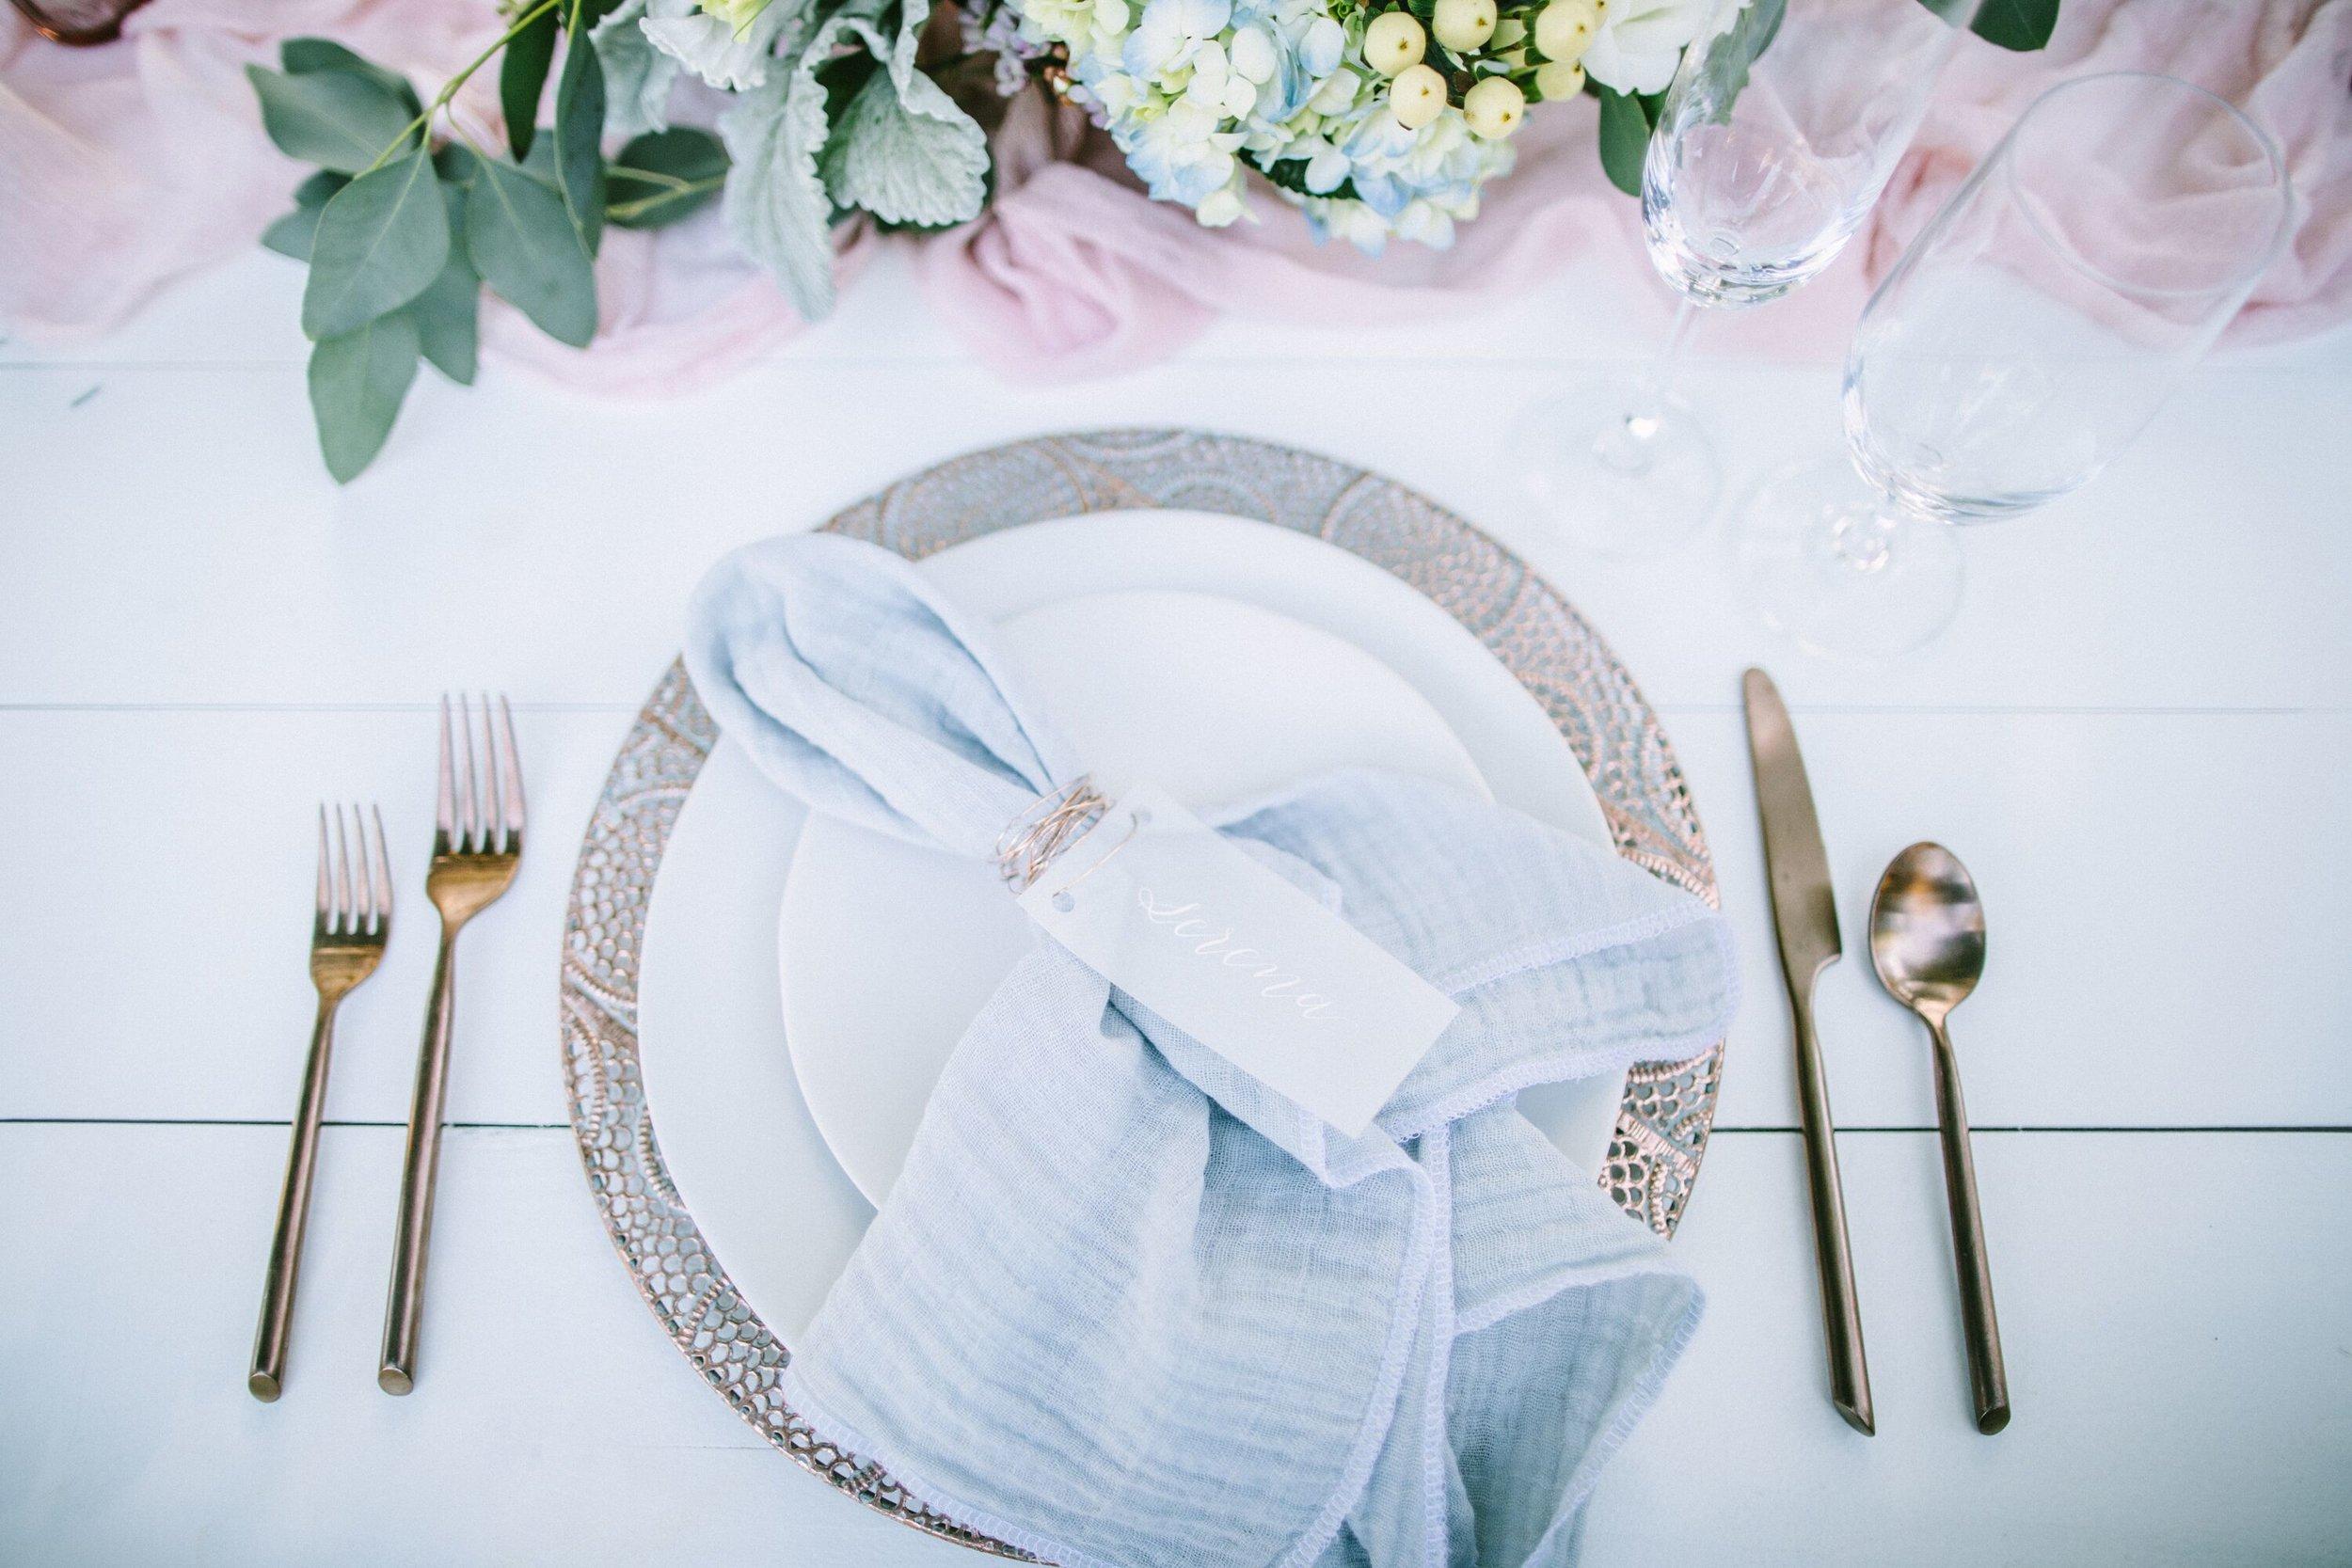 www.santabarbarawedding.com | Photographer: Patrick Ang | Venue: Rancho La Patera & Stow House | Wedding Planner: Elyse Rowen of Elyse Events | Place Setting